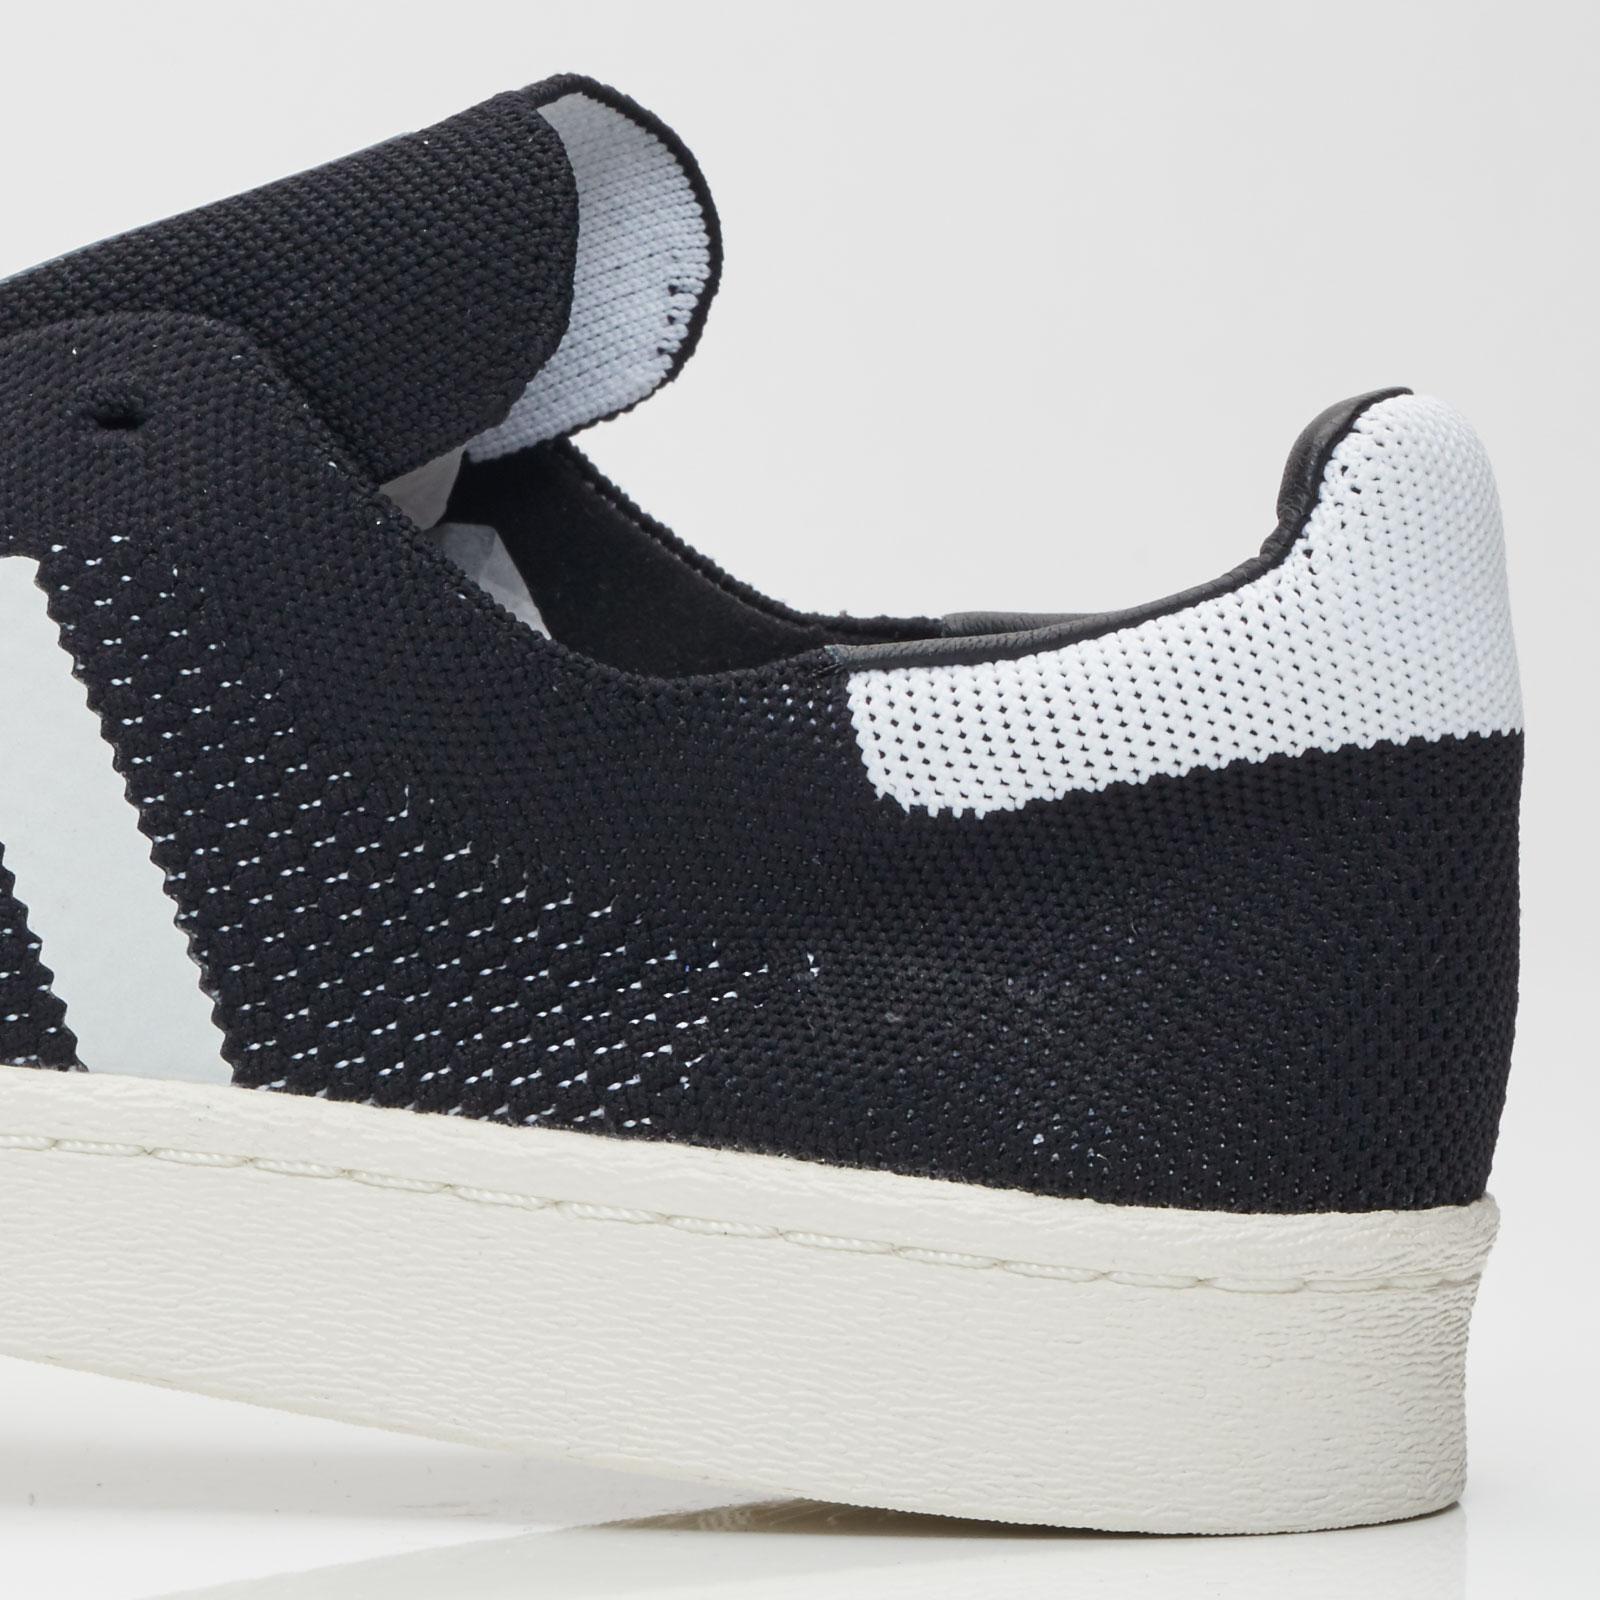 58b840a0b70c adidas Superstar Boost Pk - Bb0191 - Sneakersnstuff